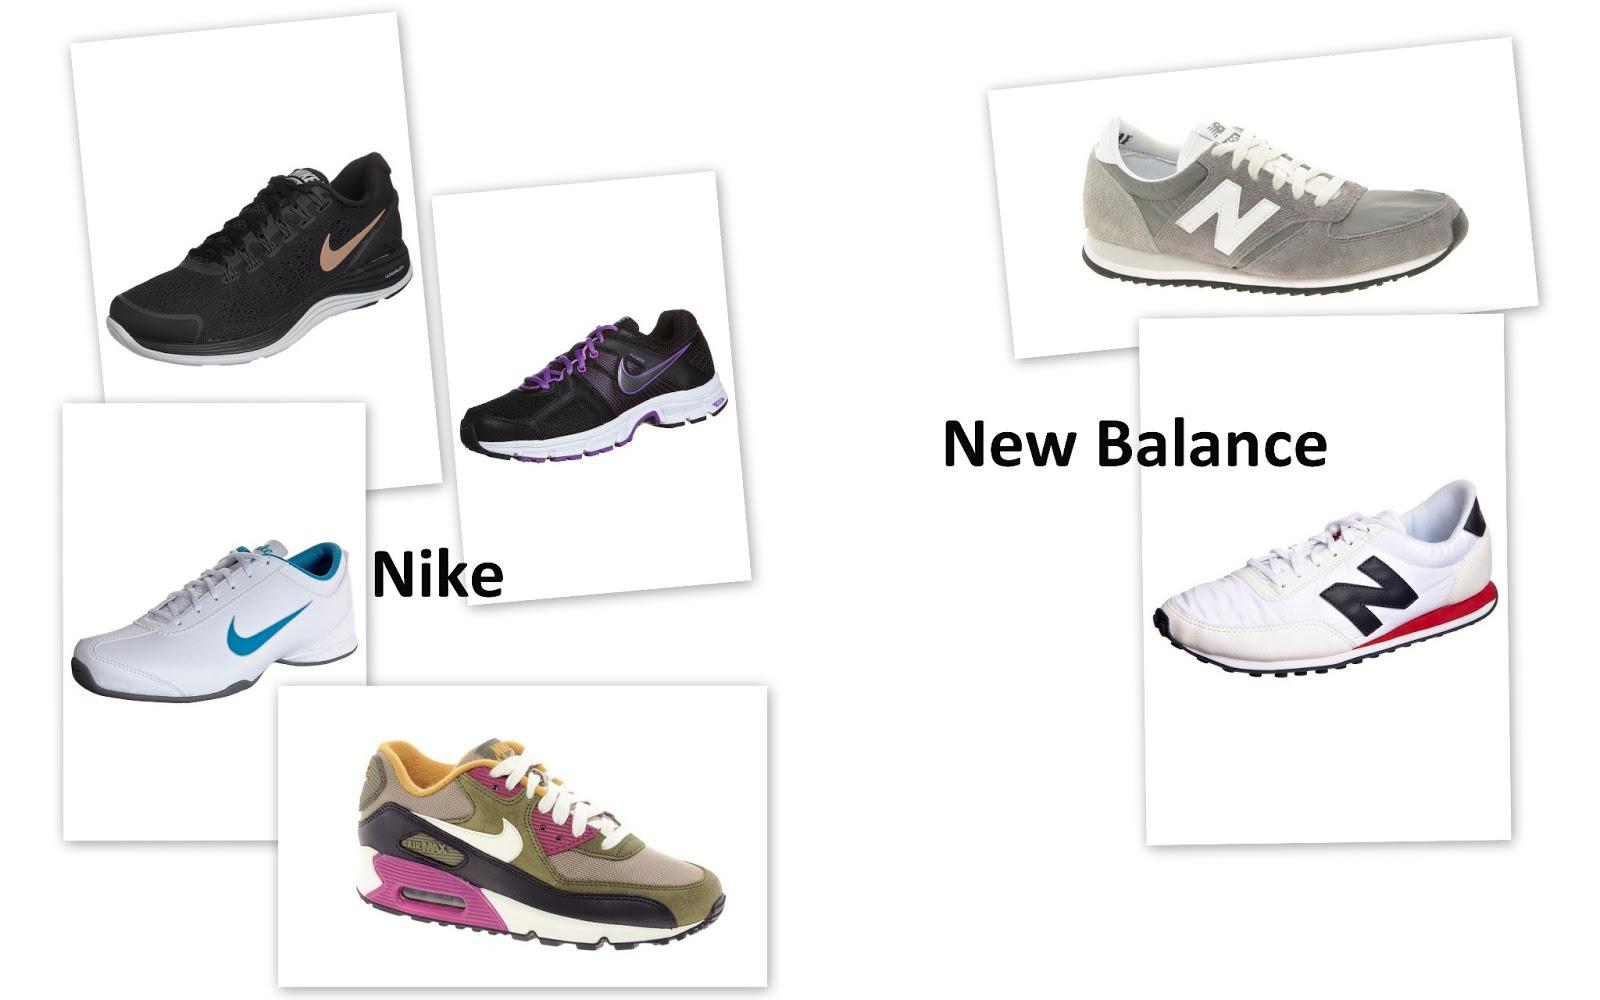 deportivas nike new balance